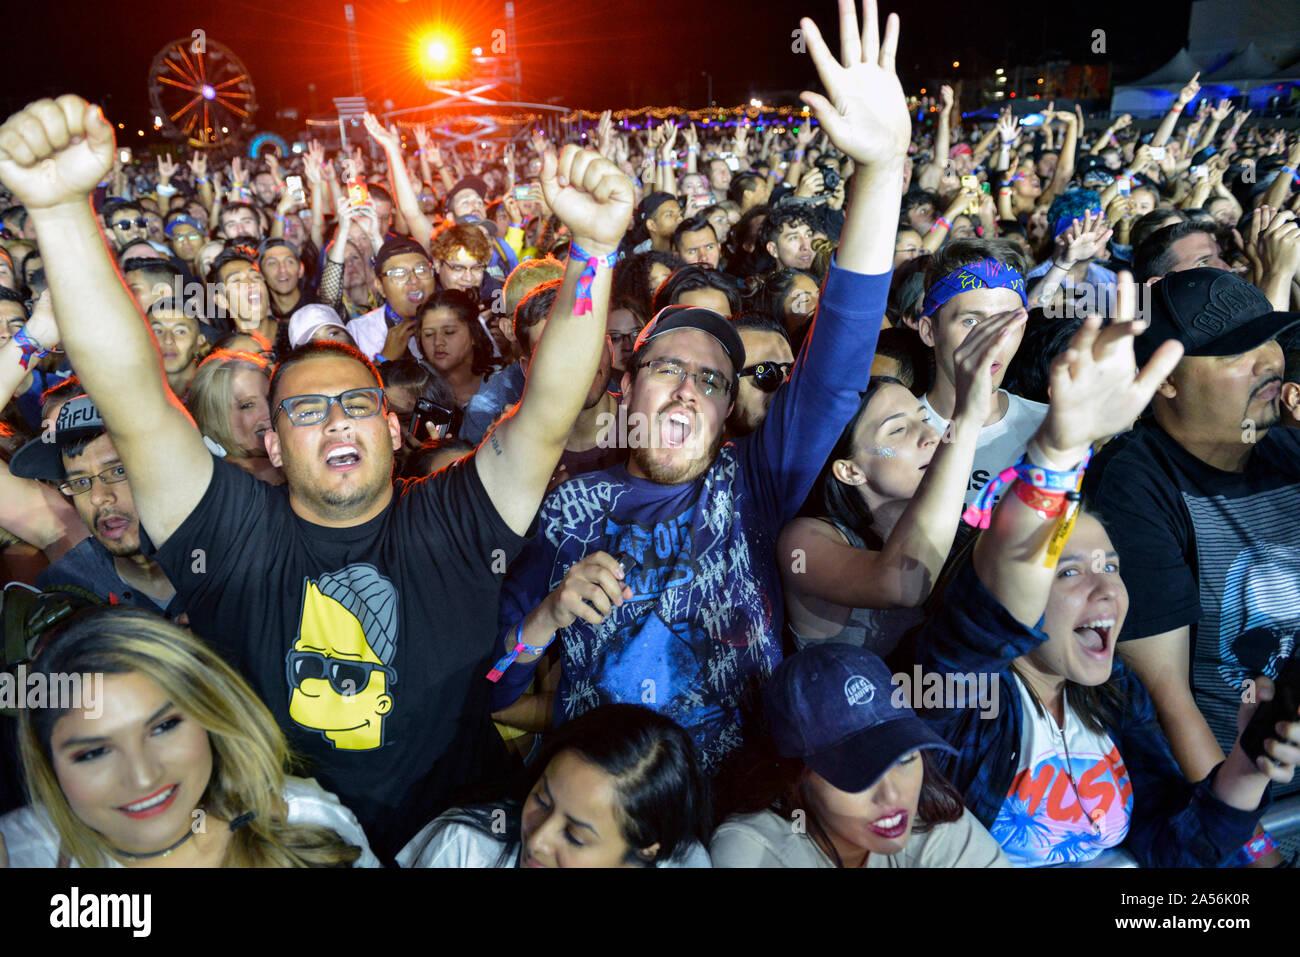 Concert Crowd Shot Stock Photo